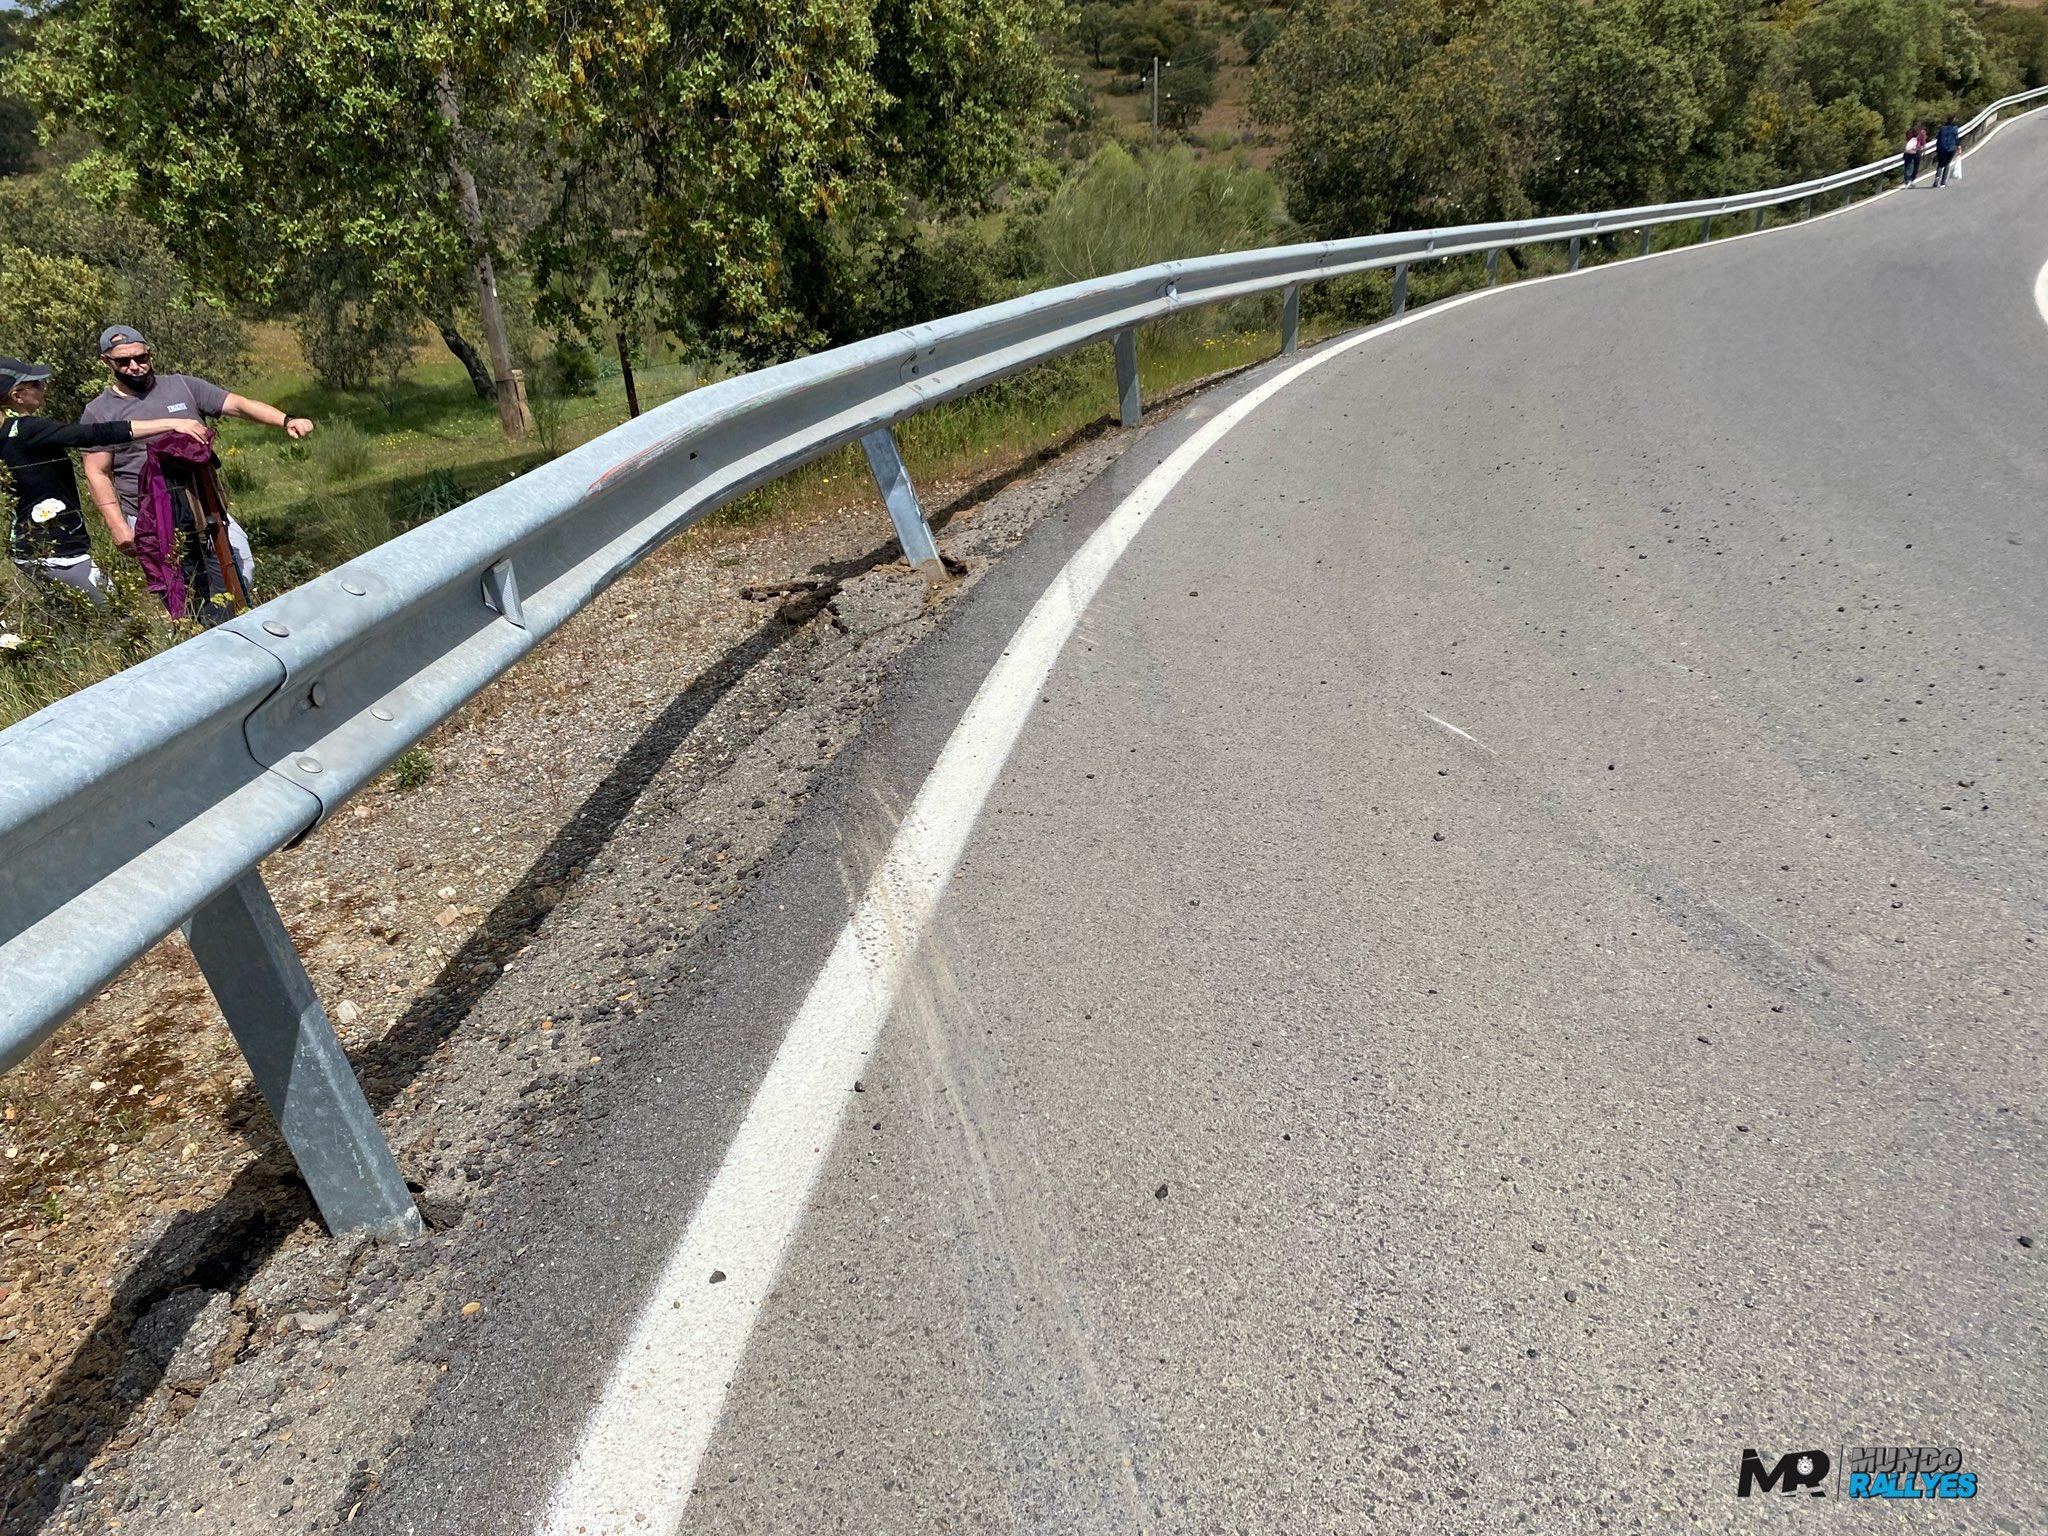 SCER + CERA + CERVH: 38º Rallye Sierra Morena - Internacional [8-10 Abril] - Página 4 EynAJPyWYAgJ7nR?format=jpg&name=large